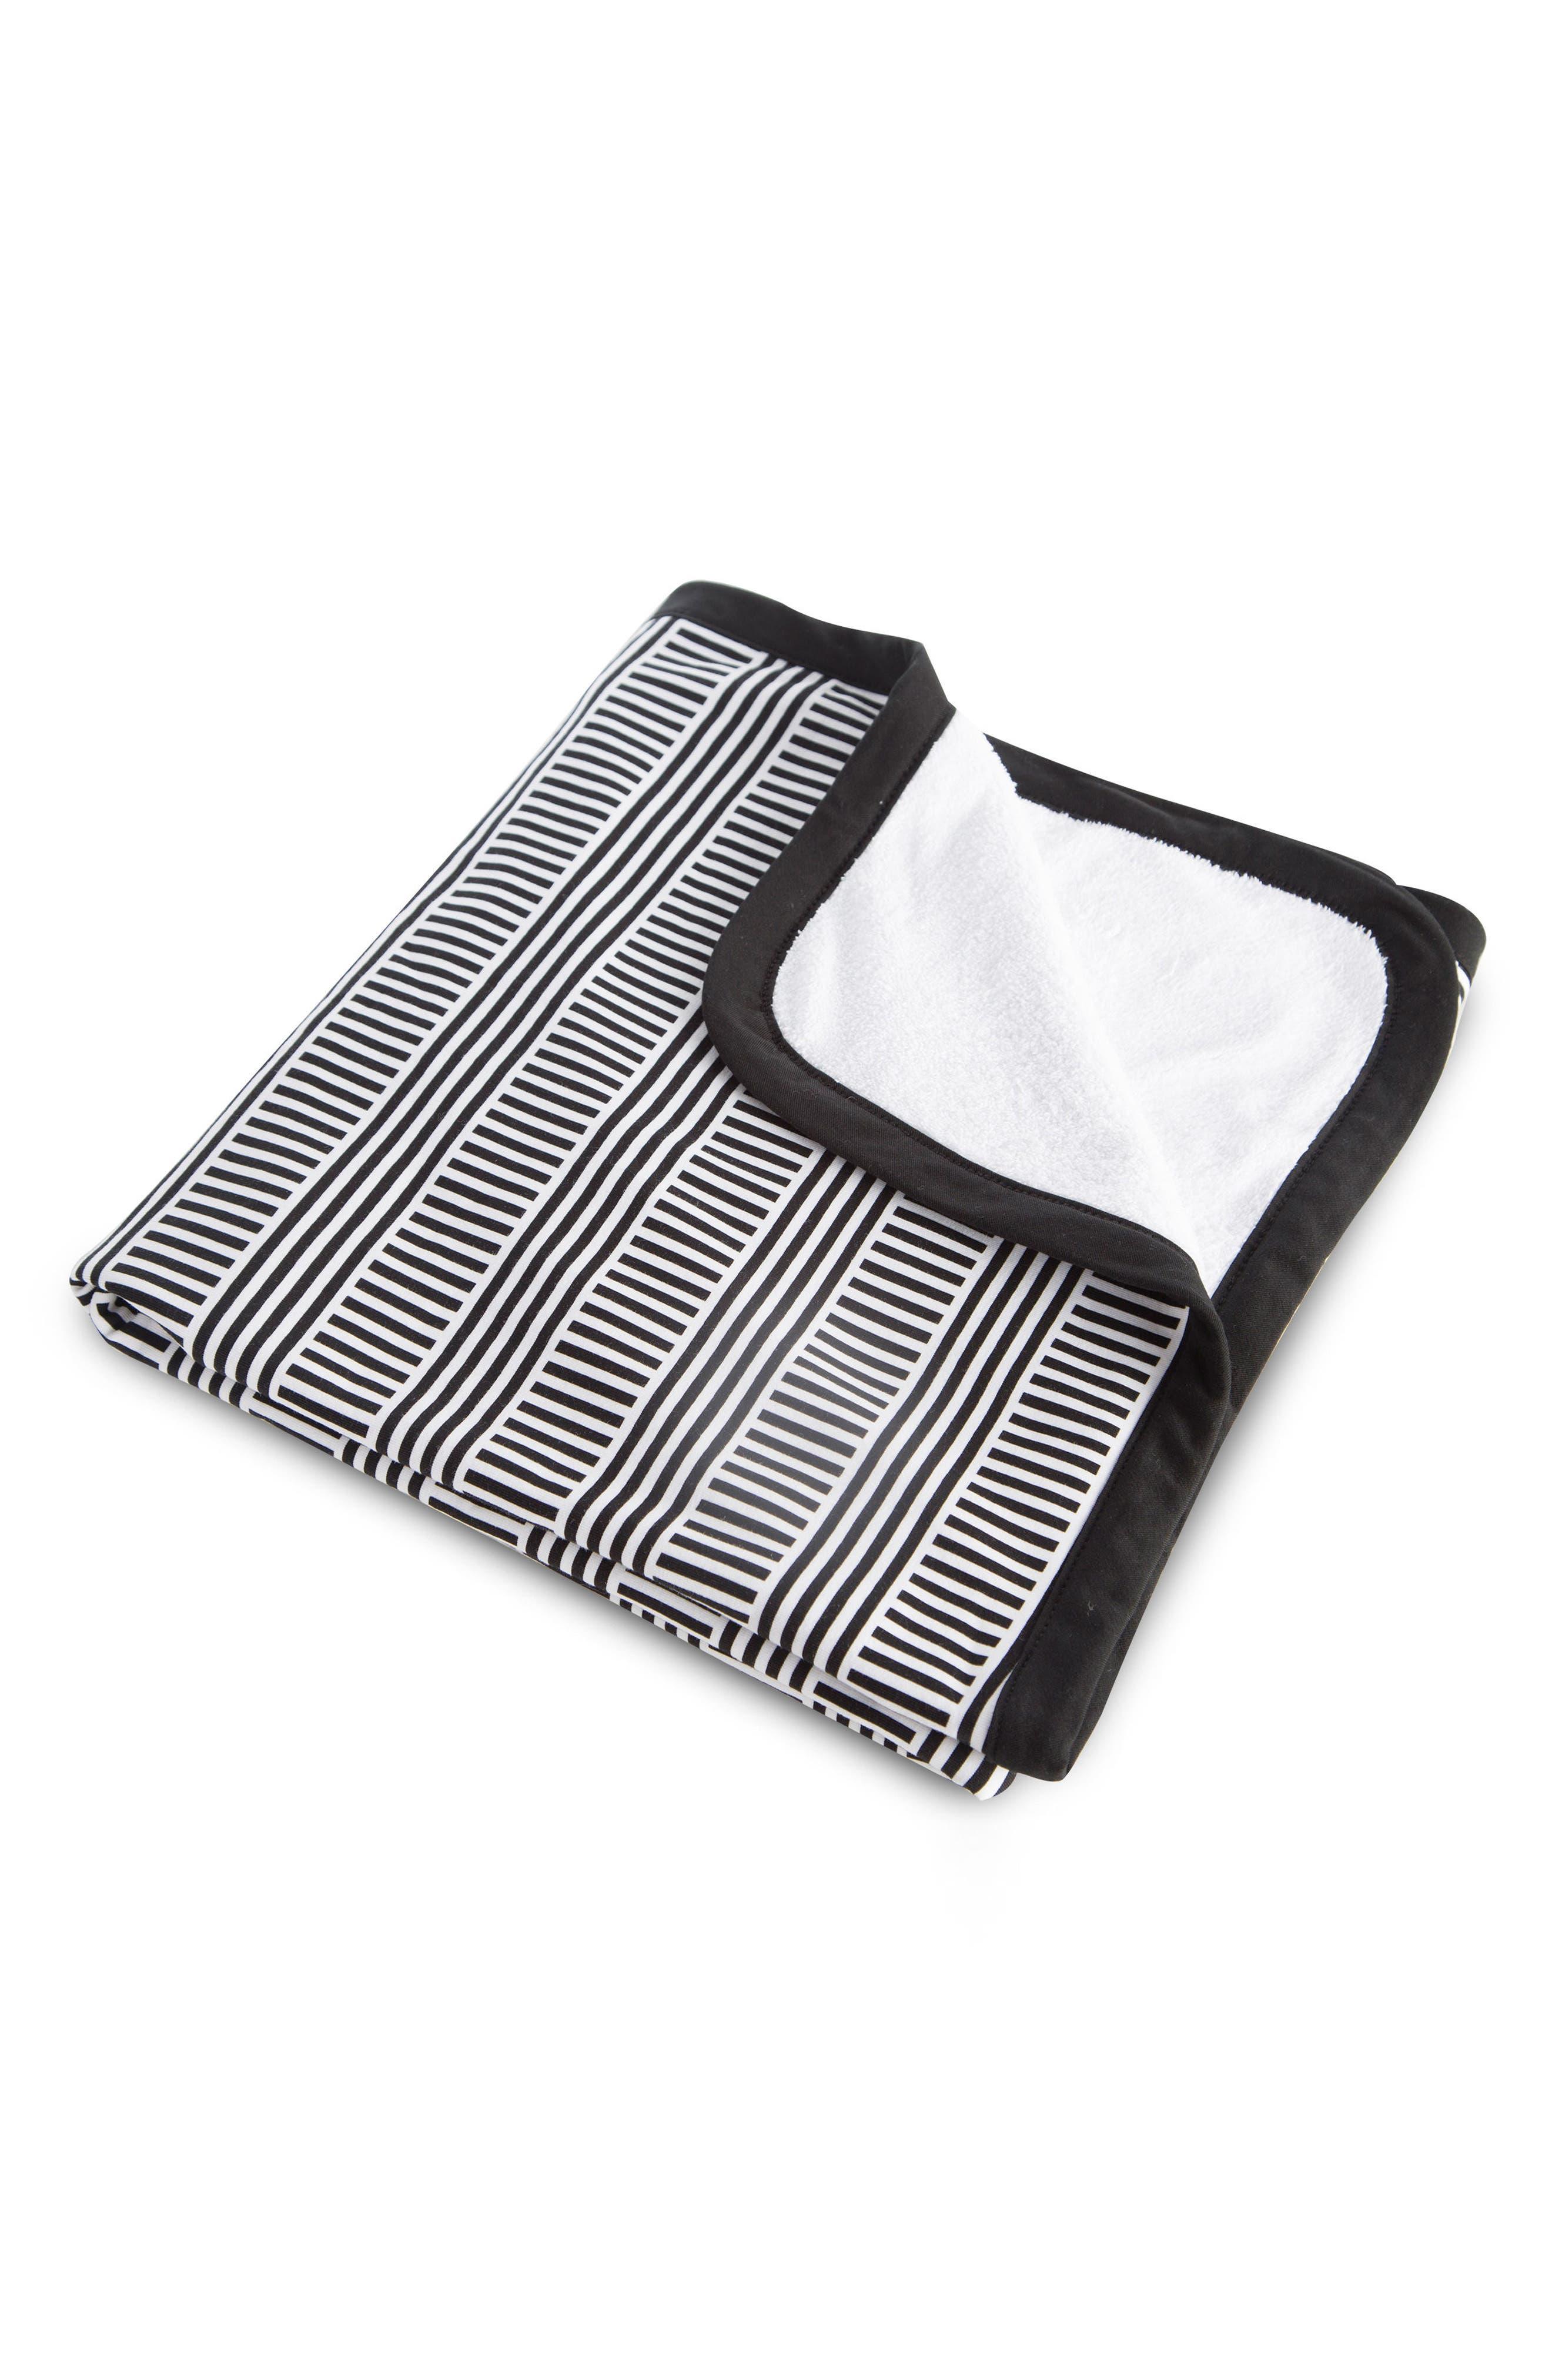 Cuddle Blanket,                             Alternate thumbnail 10, color,                             Black/ White